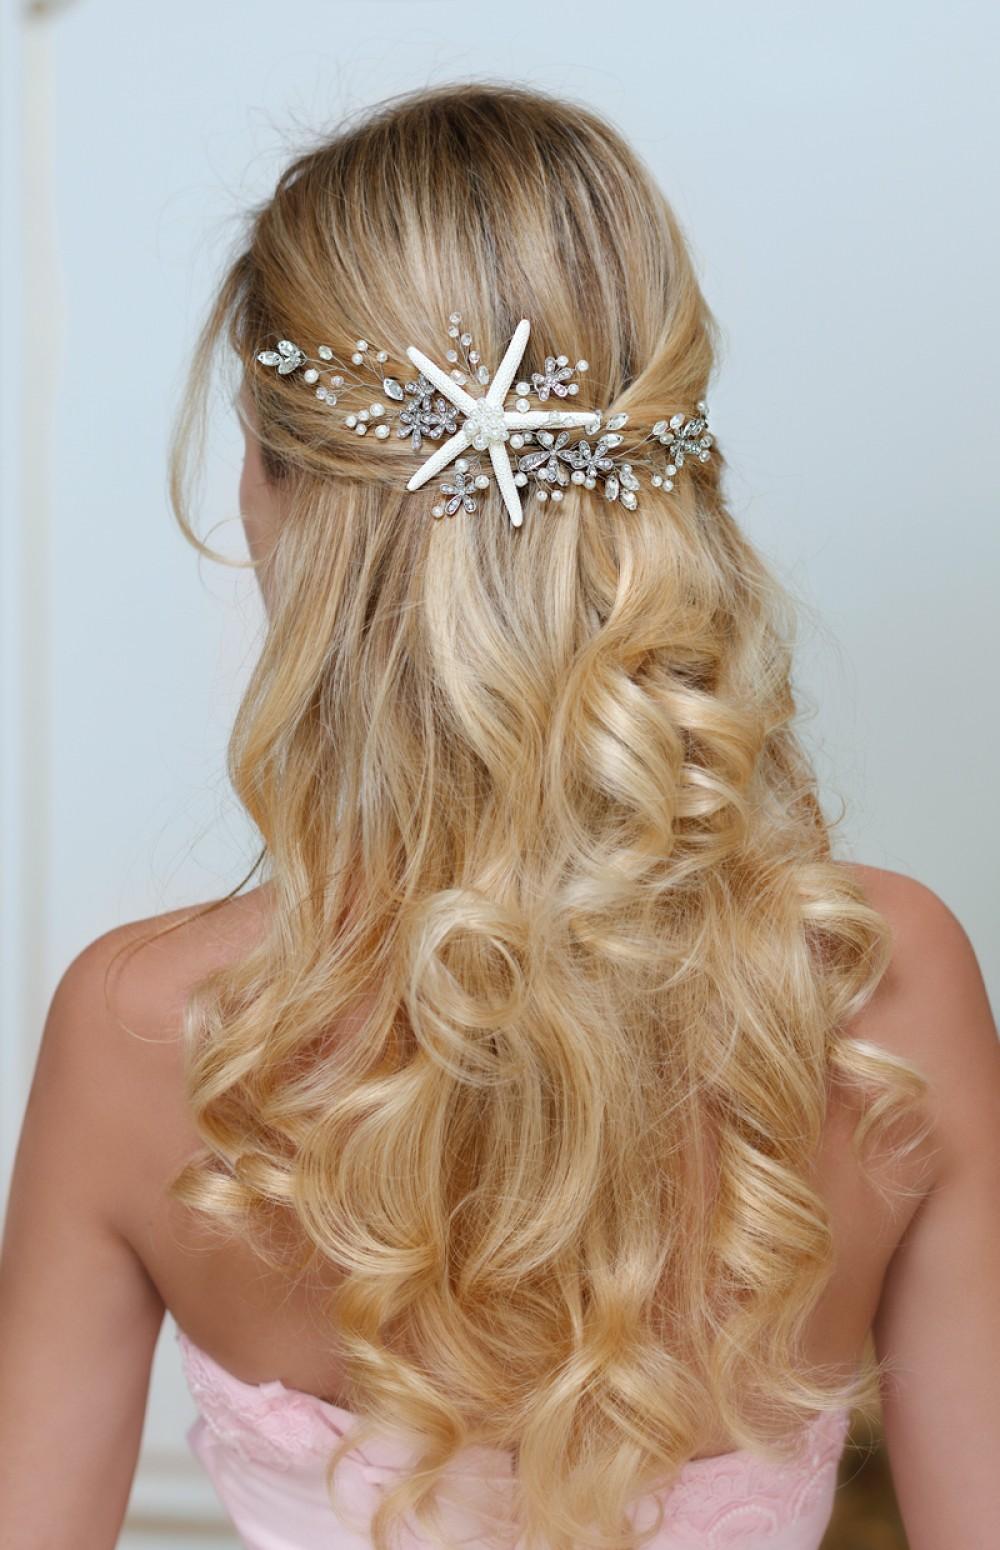 Despoina Starfish Headband For Destination Wedding Beach Hair Accessories By Topgracia